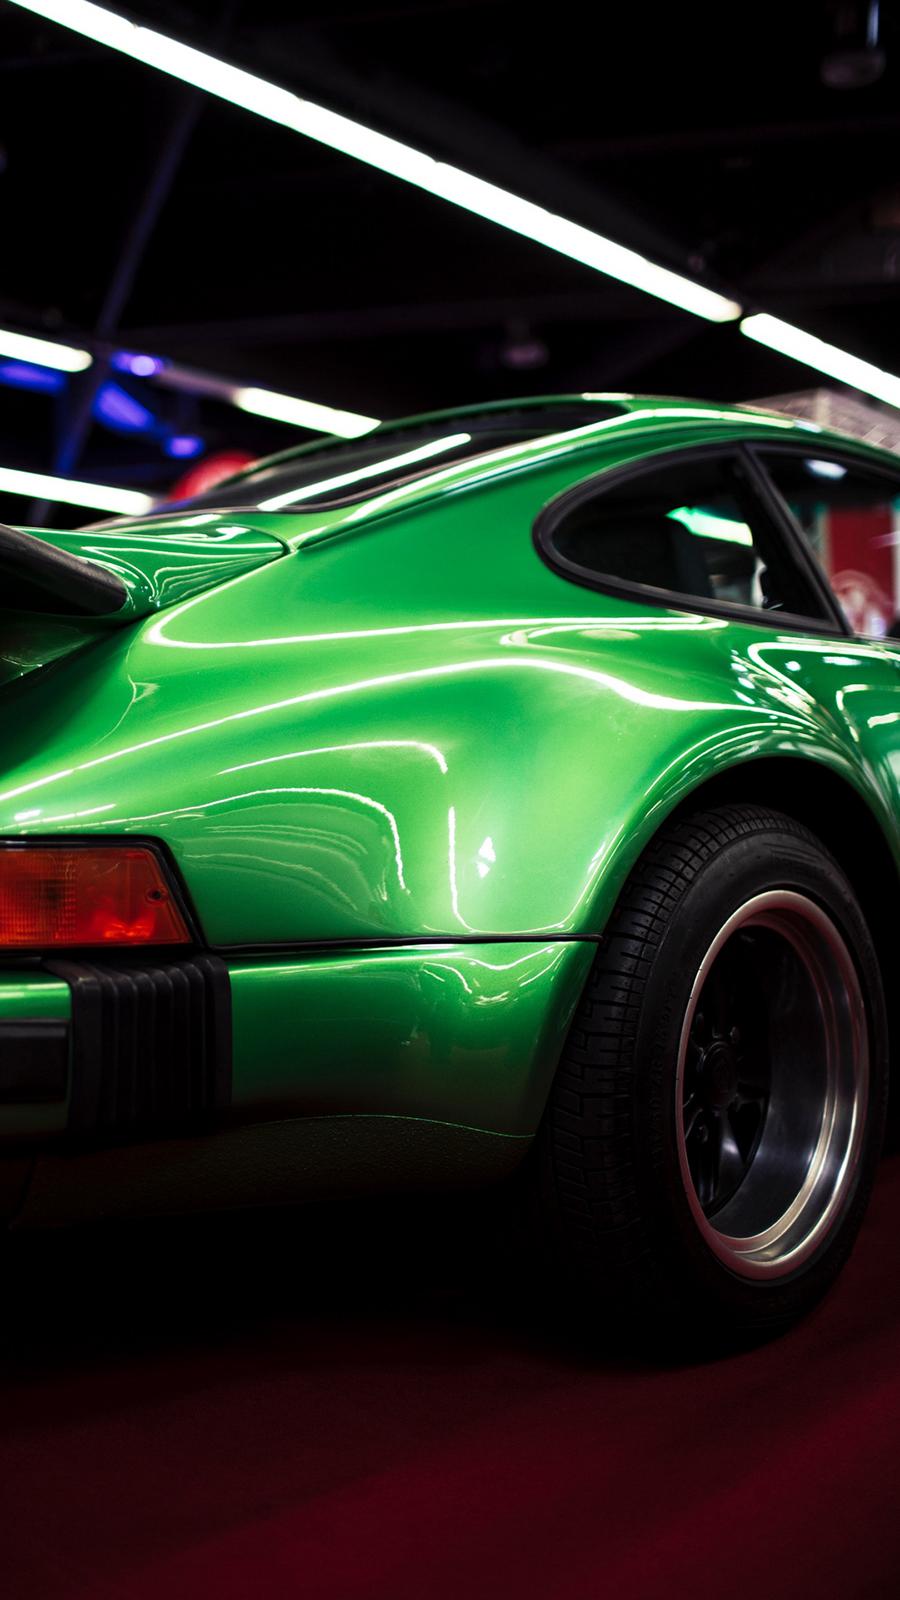 4K Green Super Car Wallpapers Free Download